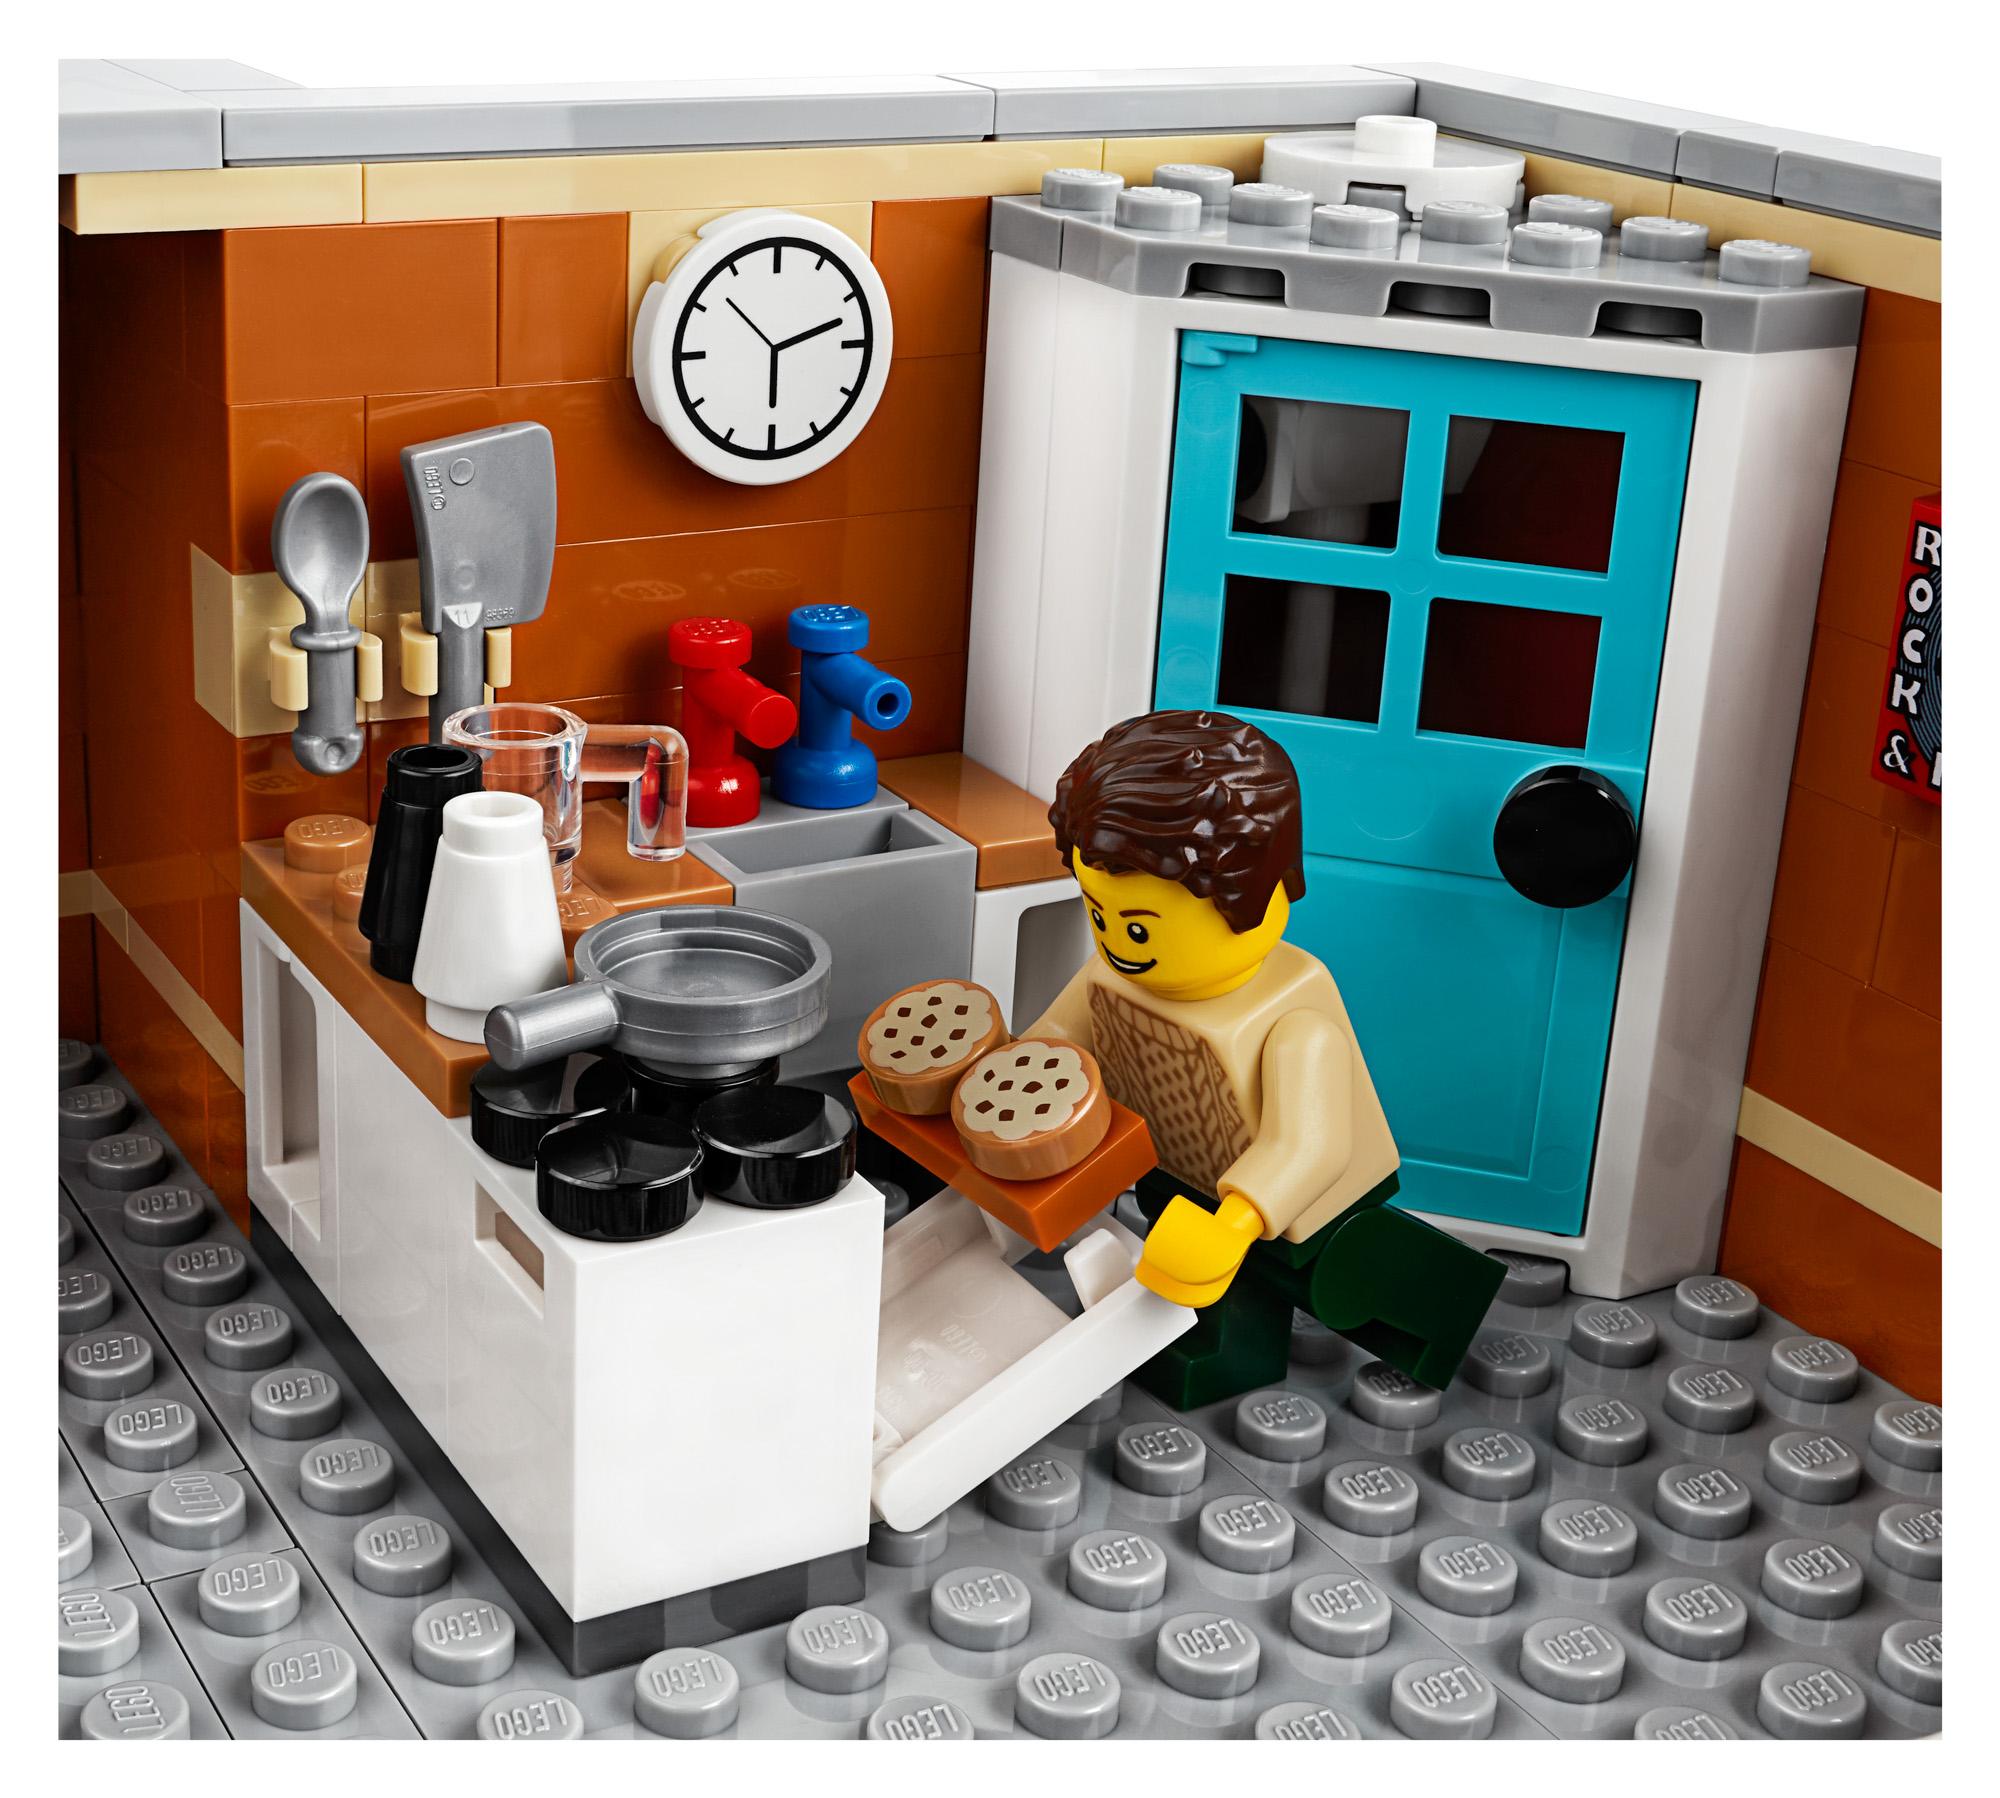 10264 Corner Garage revealed as 2019 LEGO Creator Expert